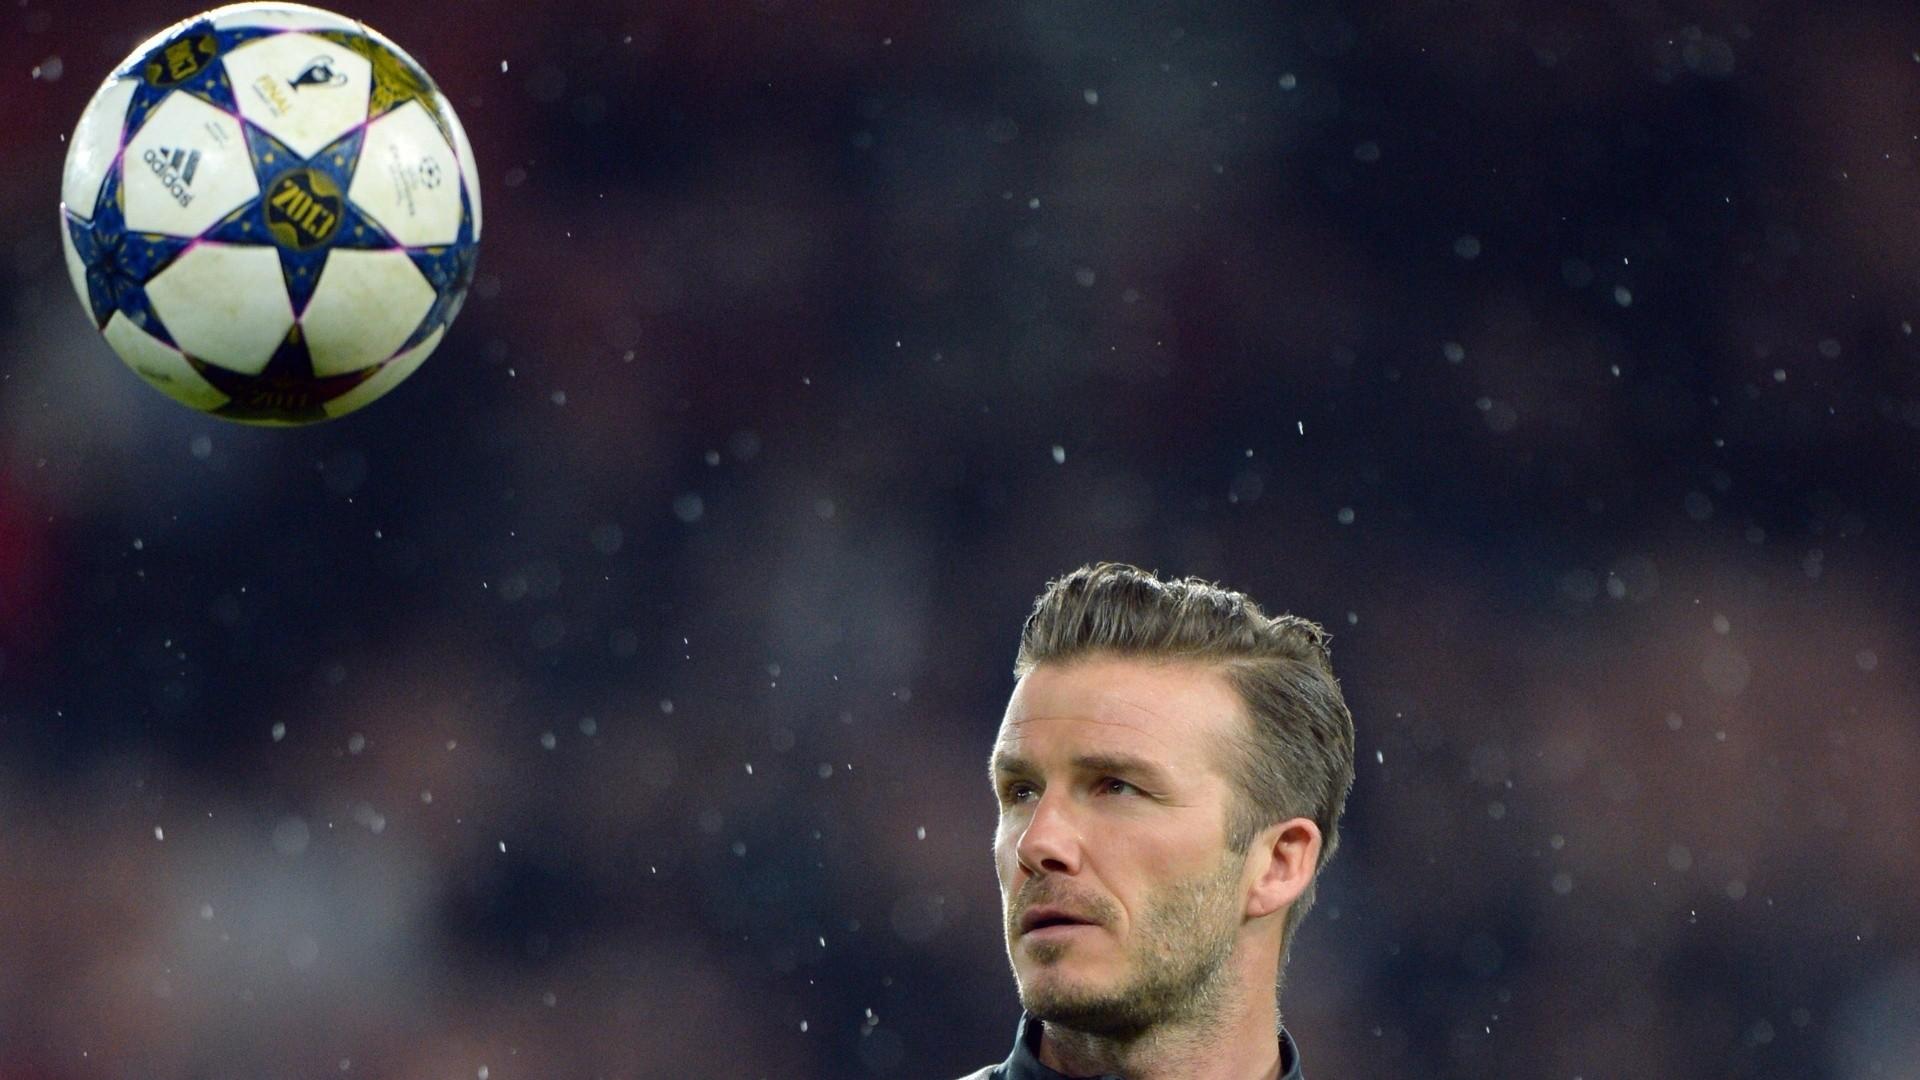 Res: 1920x1080, David Beckham Hairstyles | David Beckham Haircut - Sporteology | Sporteology